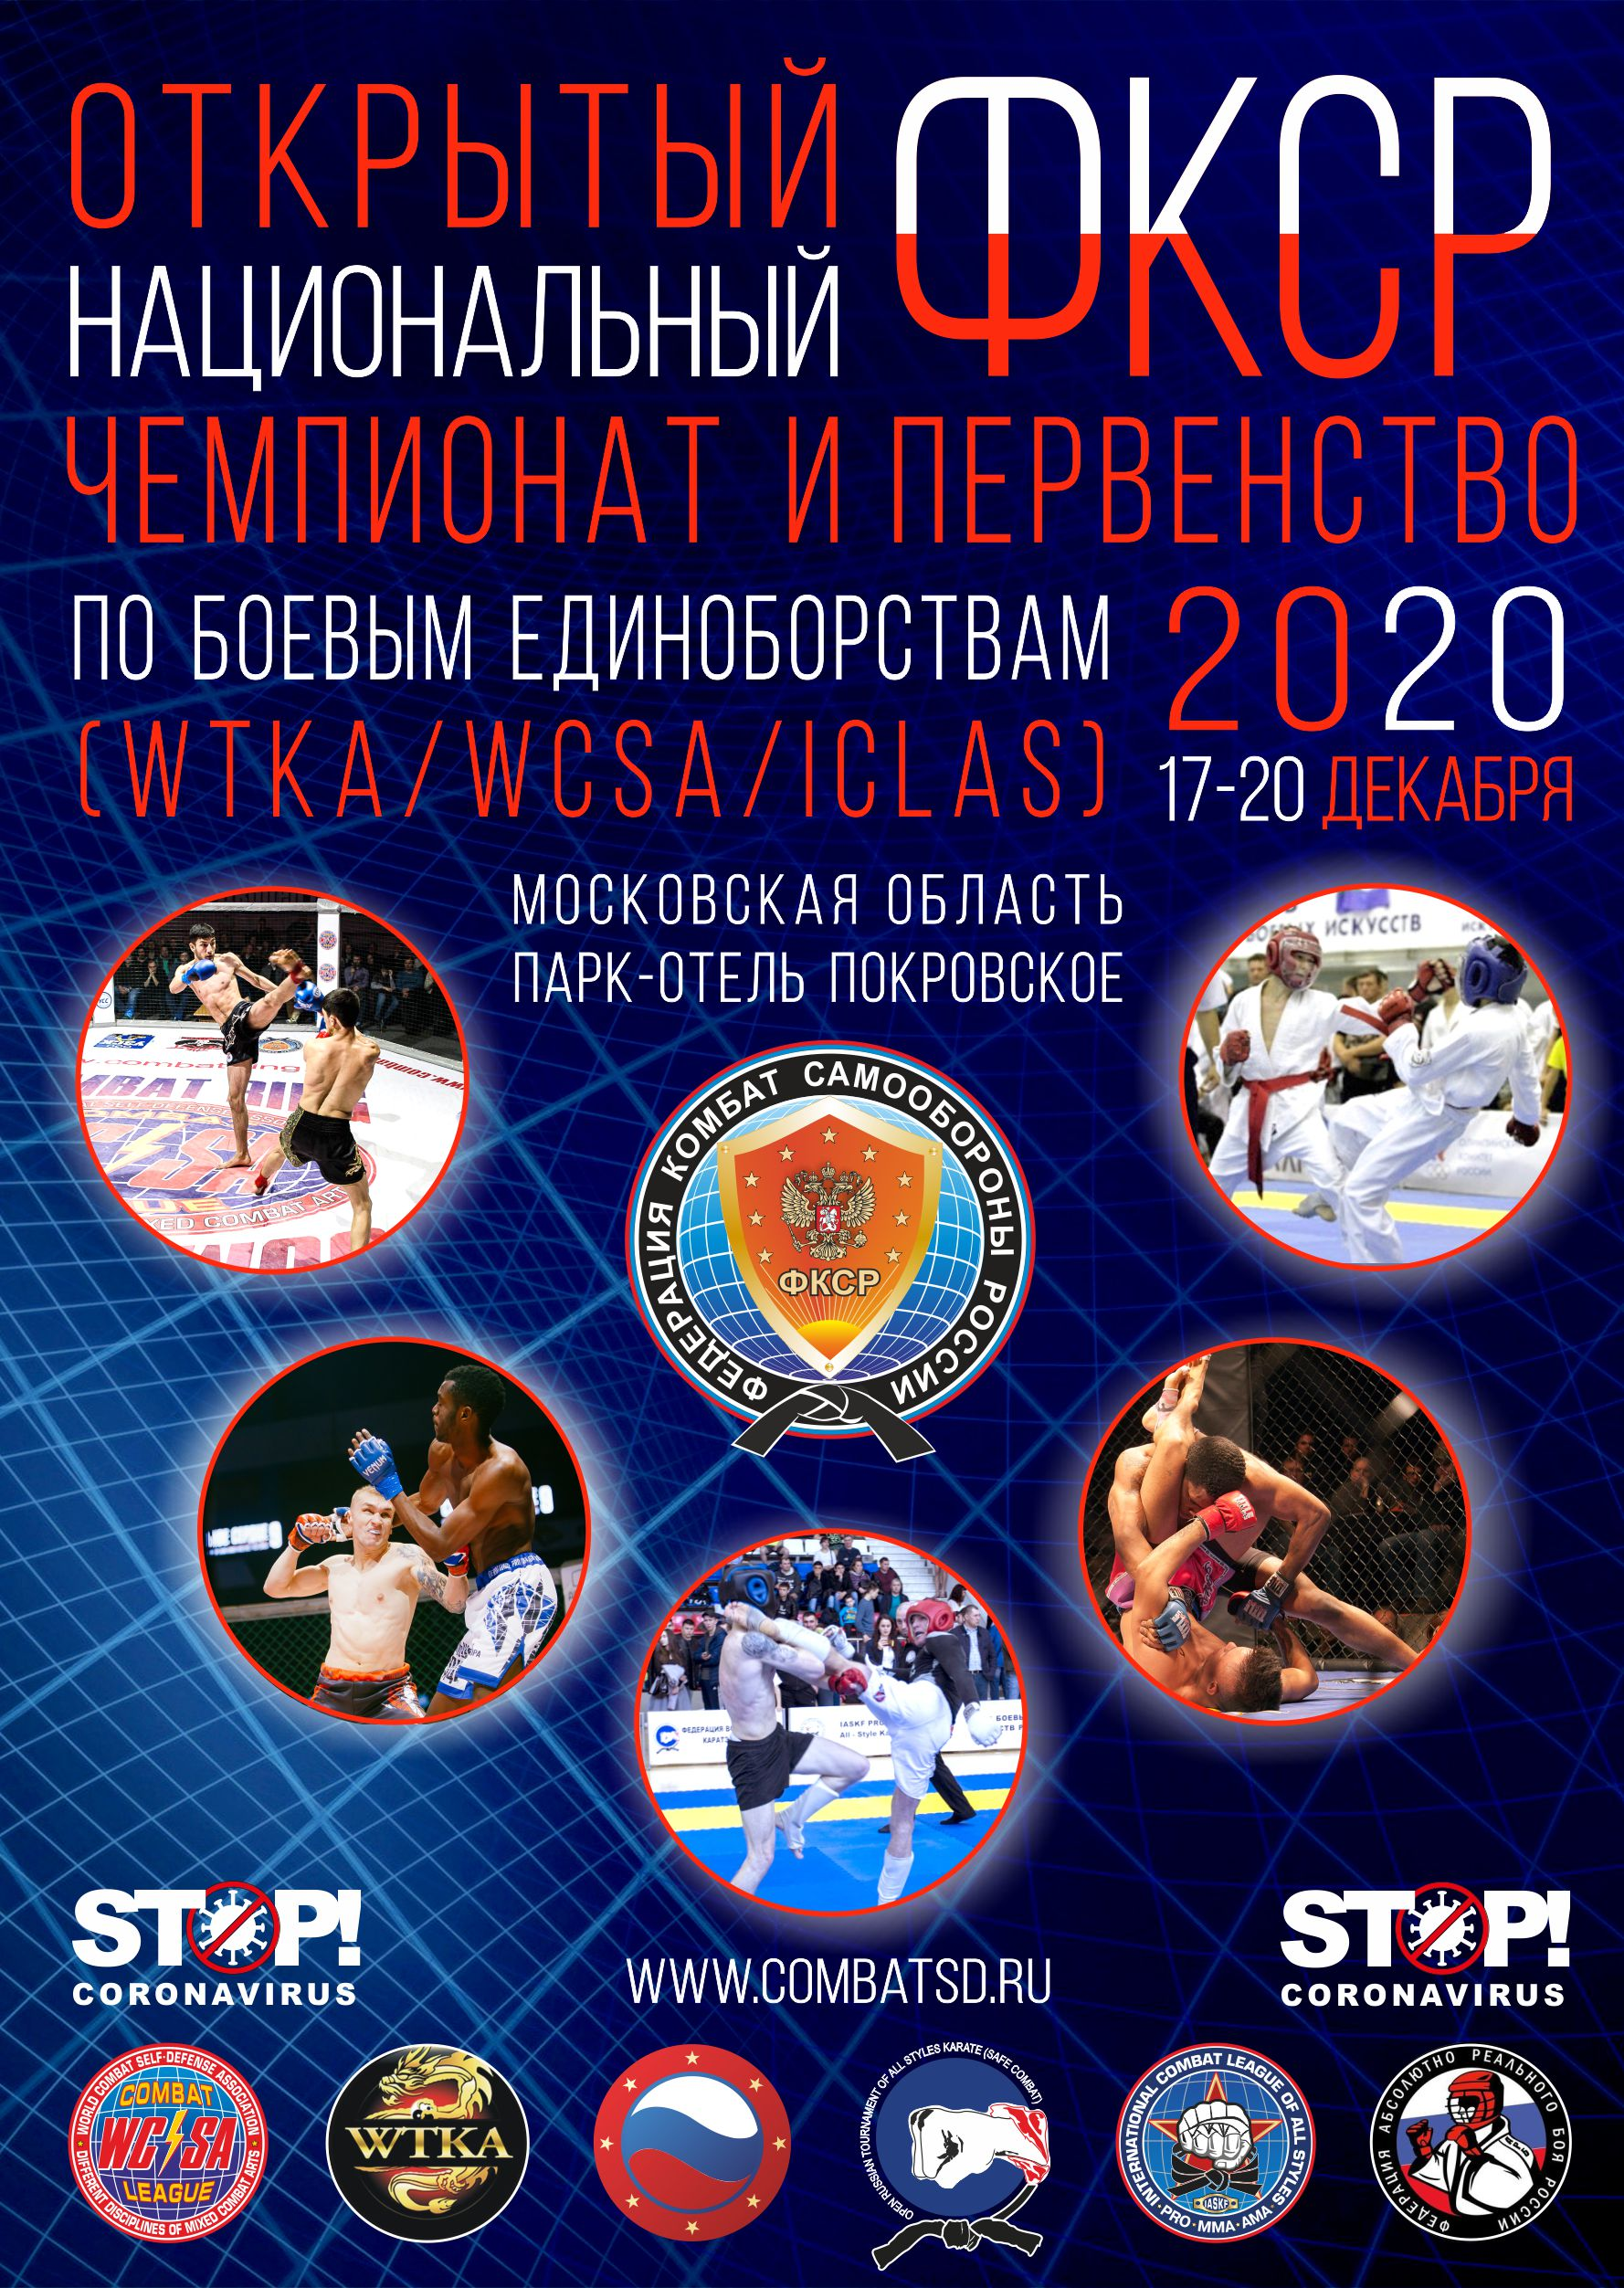 http://combatsd.ru/images/upload/Афиша_2020%20(4).jpg